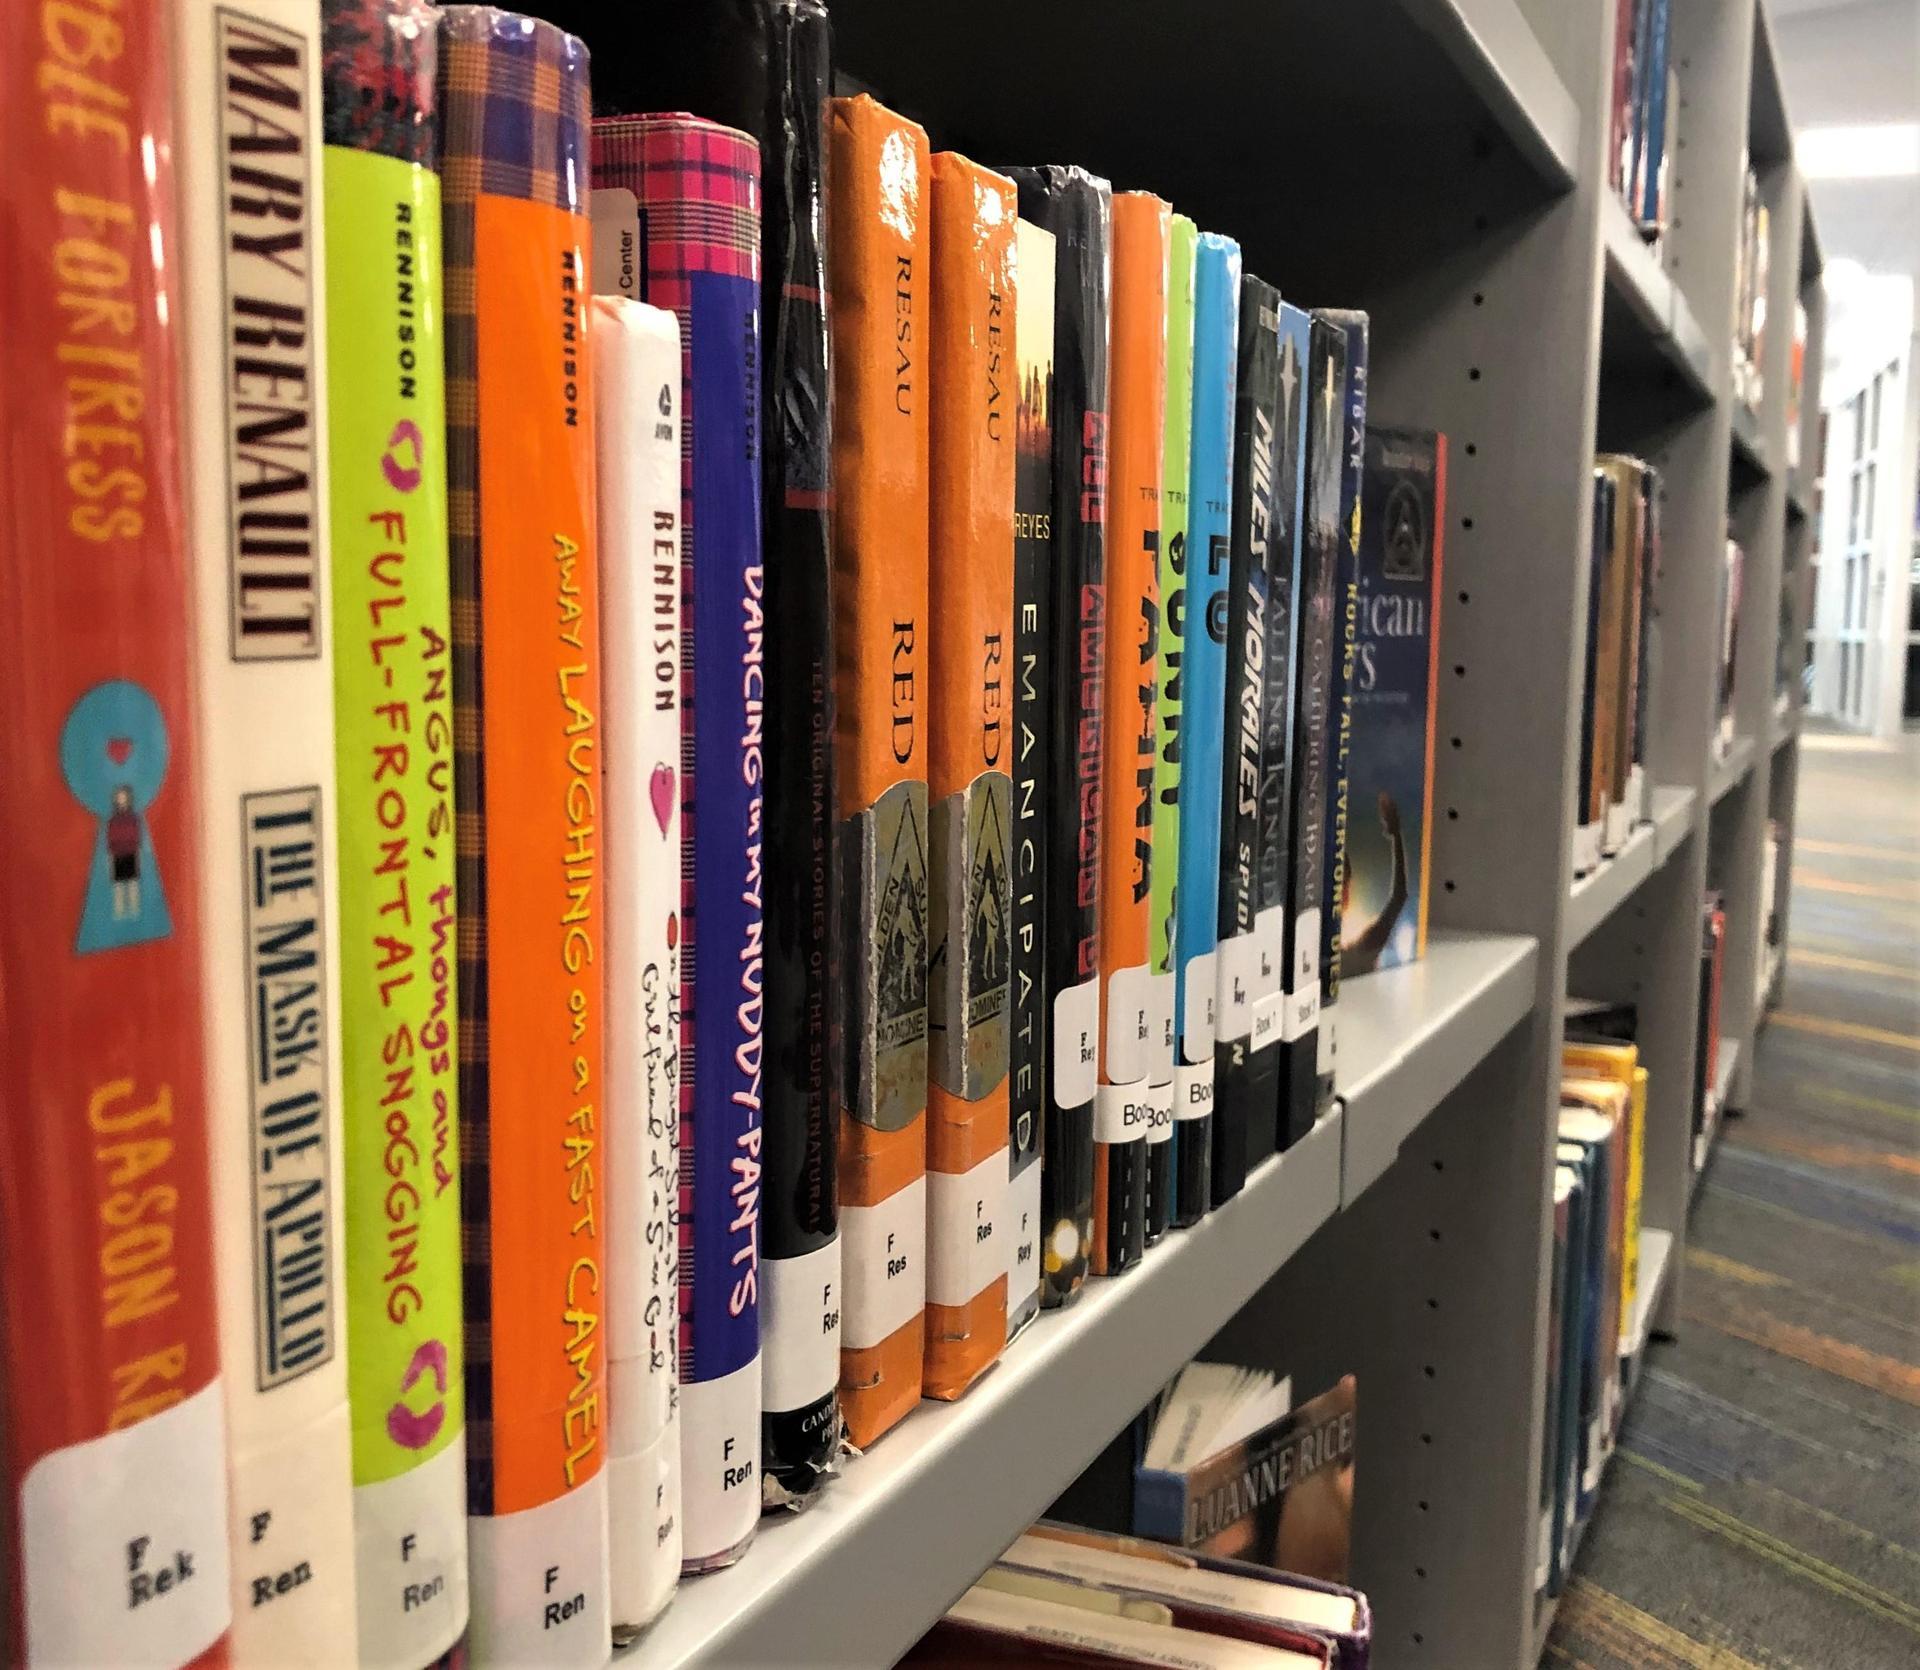 Close-up of Bookshelf